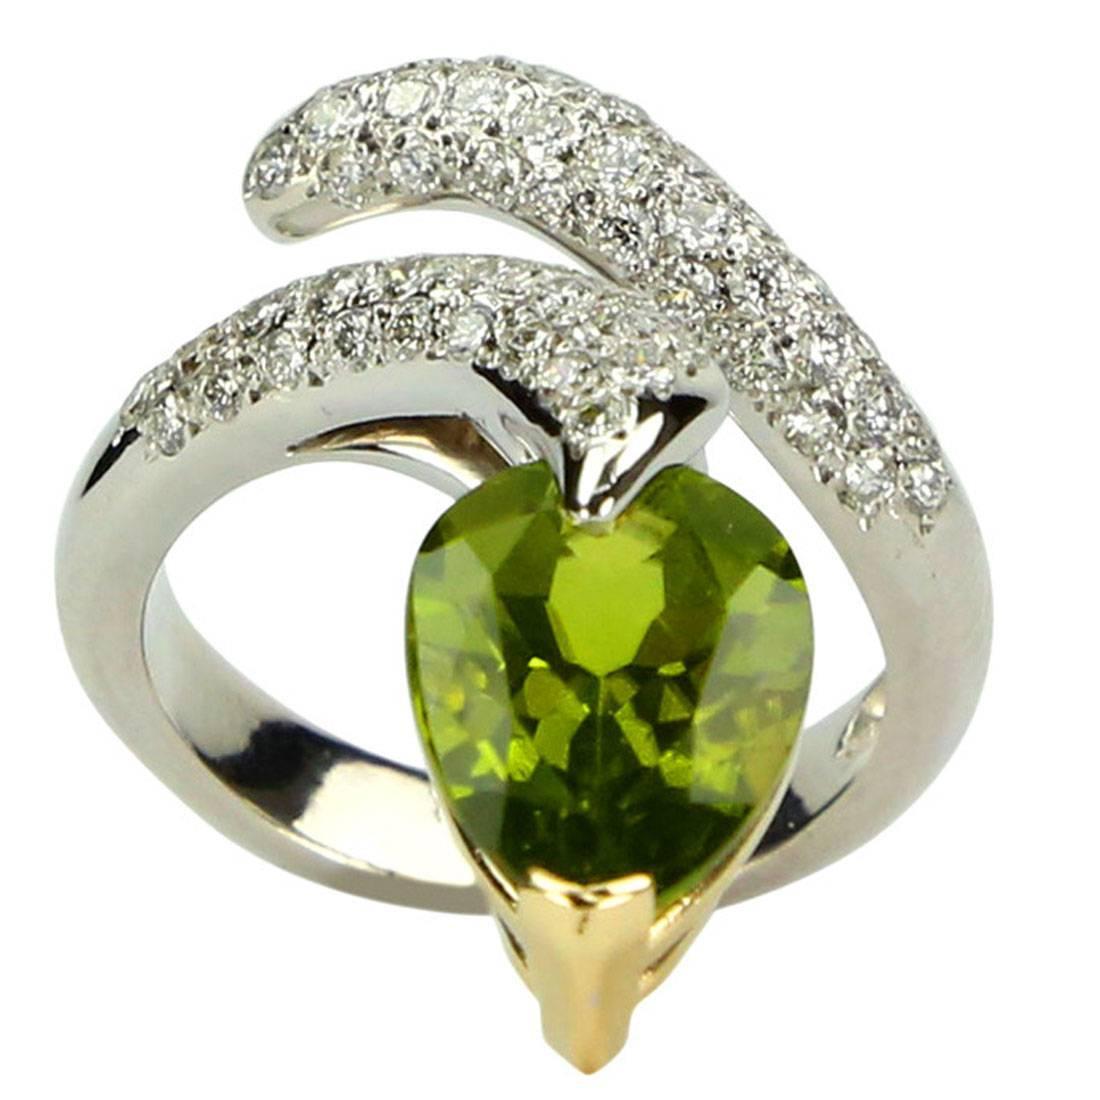 4.69 Carat Peridot and Diamond Gold Serpent Snake Ring Estate Fine Jewelry